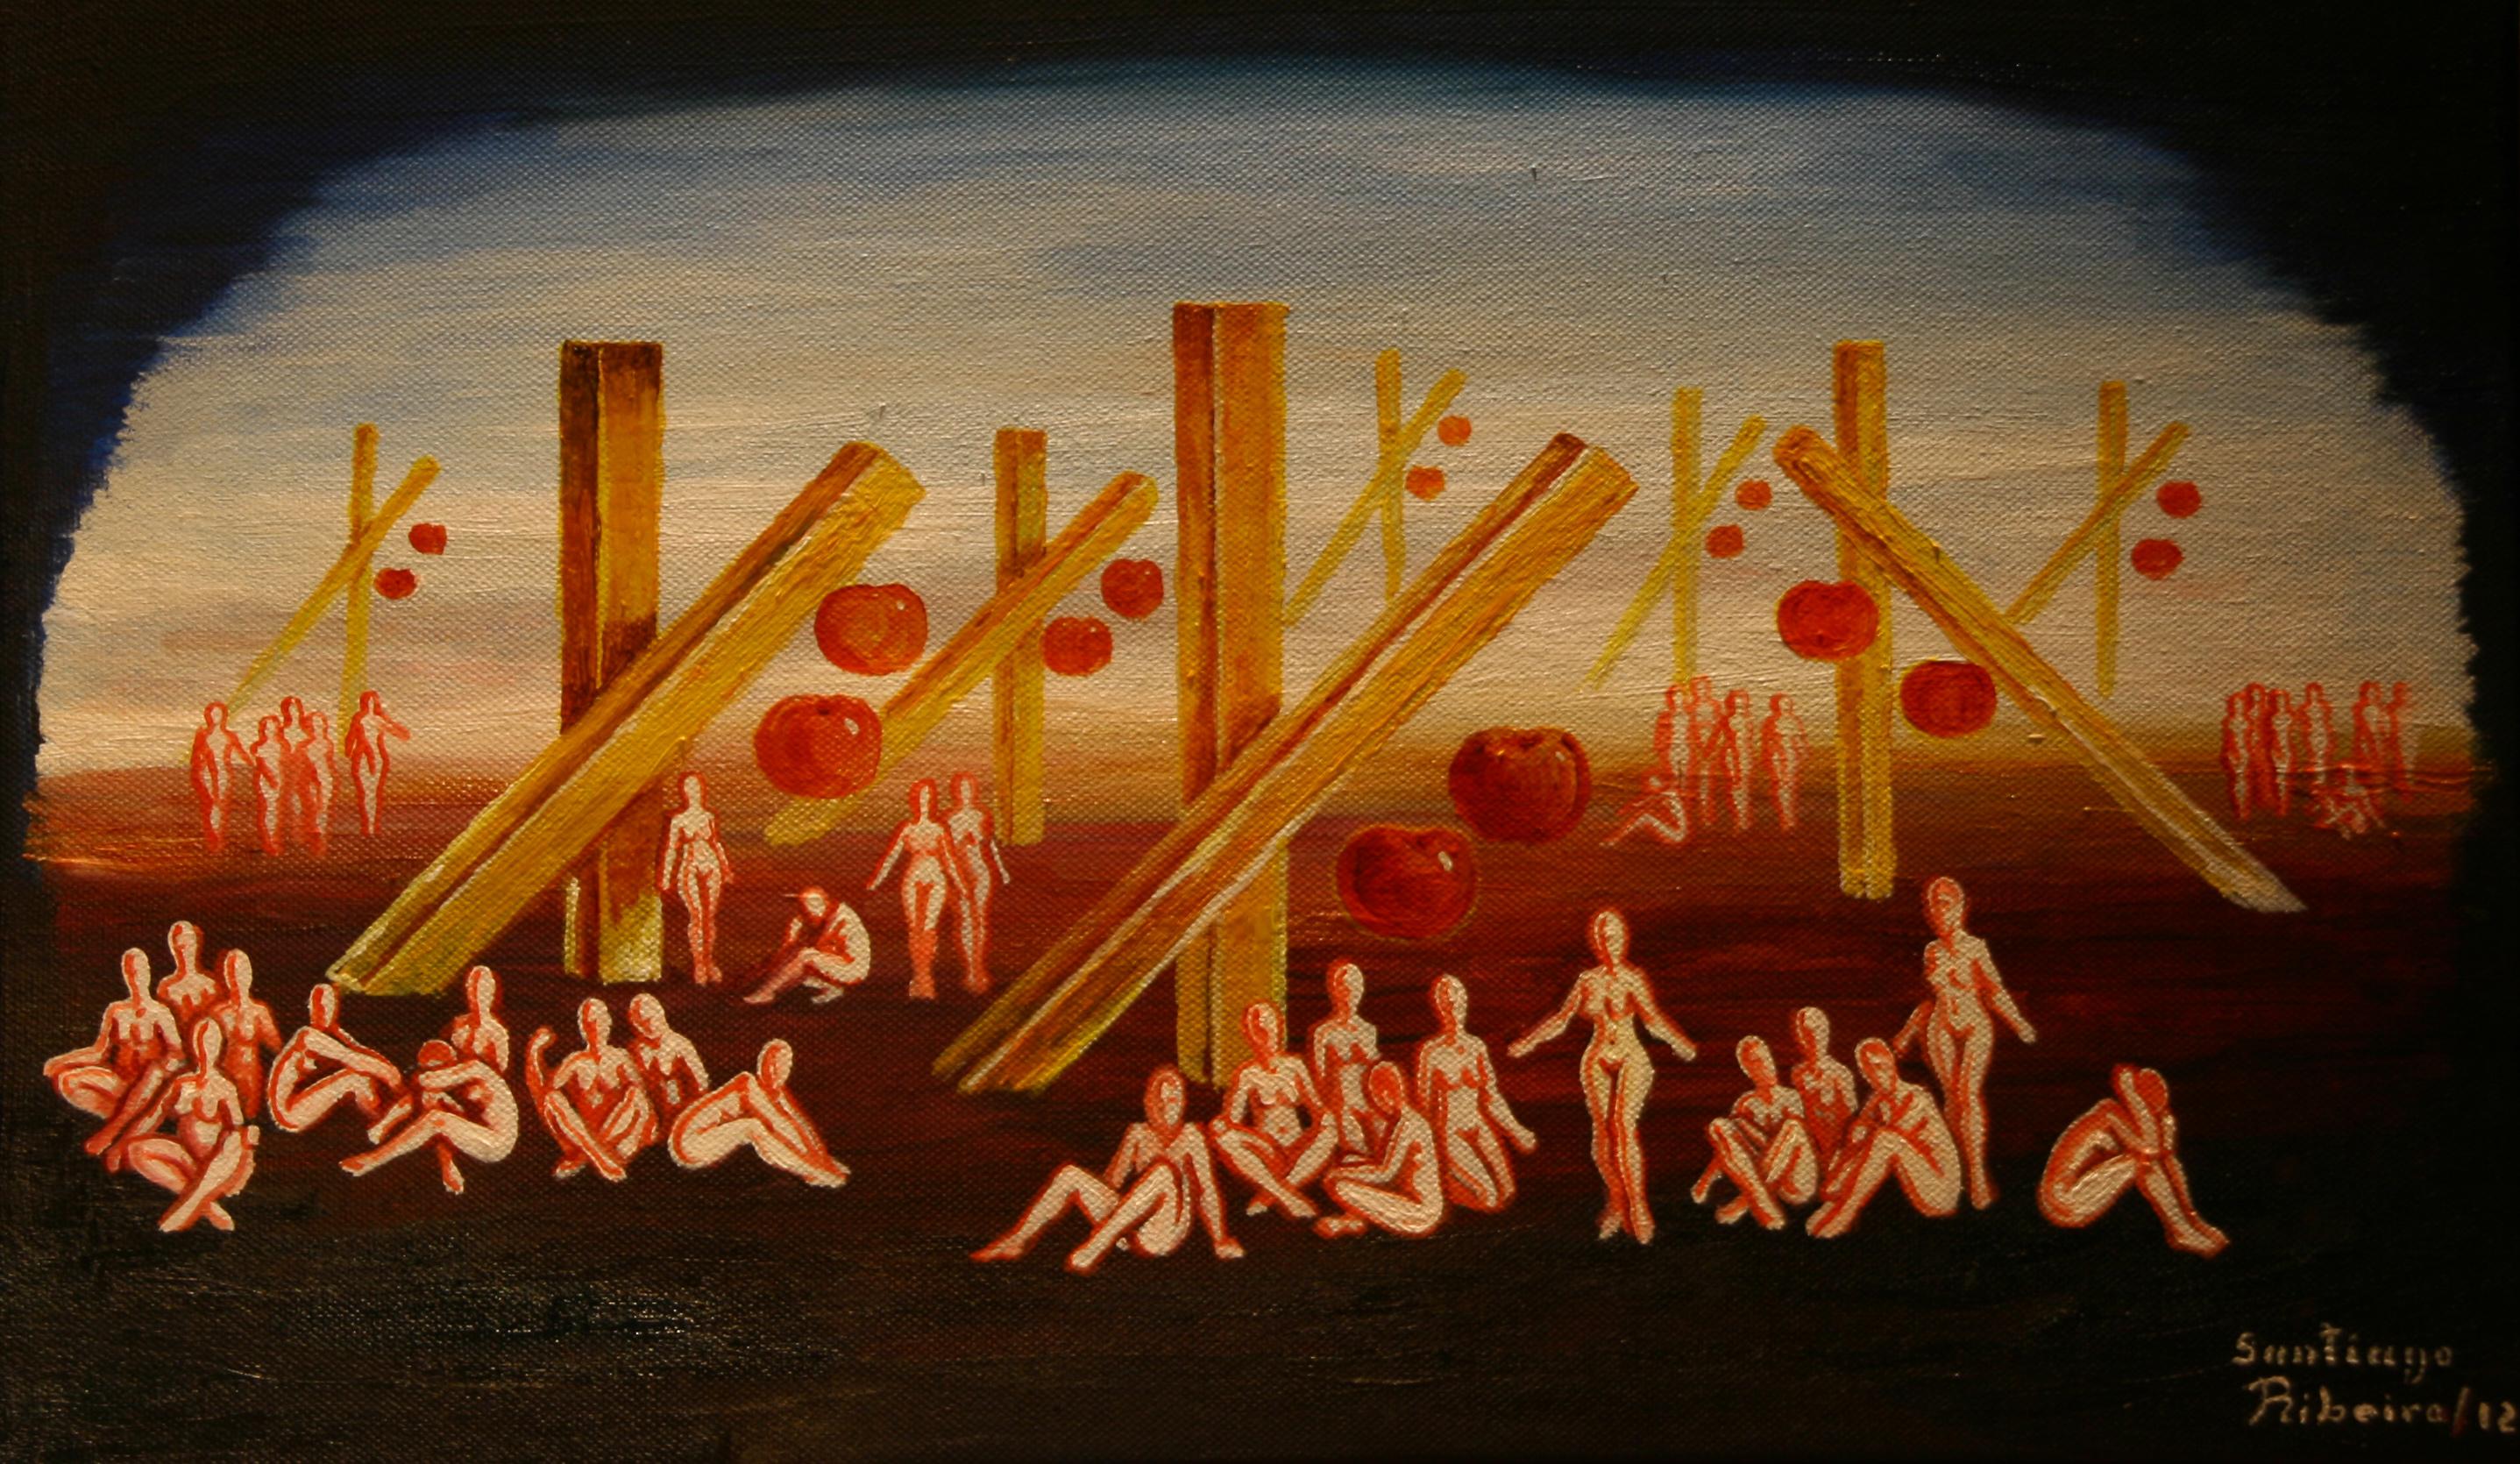 The Portuguese painter Santiago Ribeiro exhibits in the